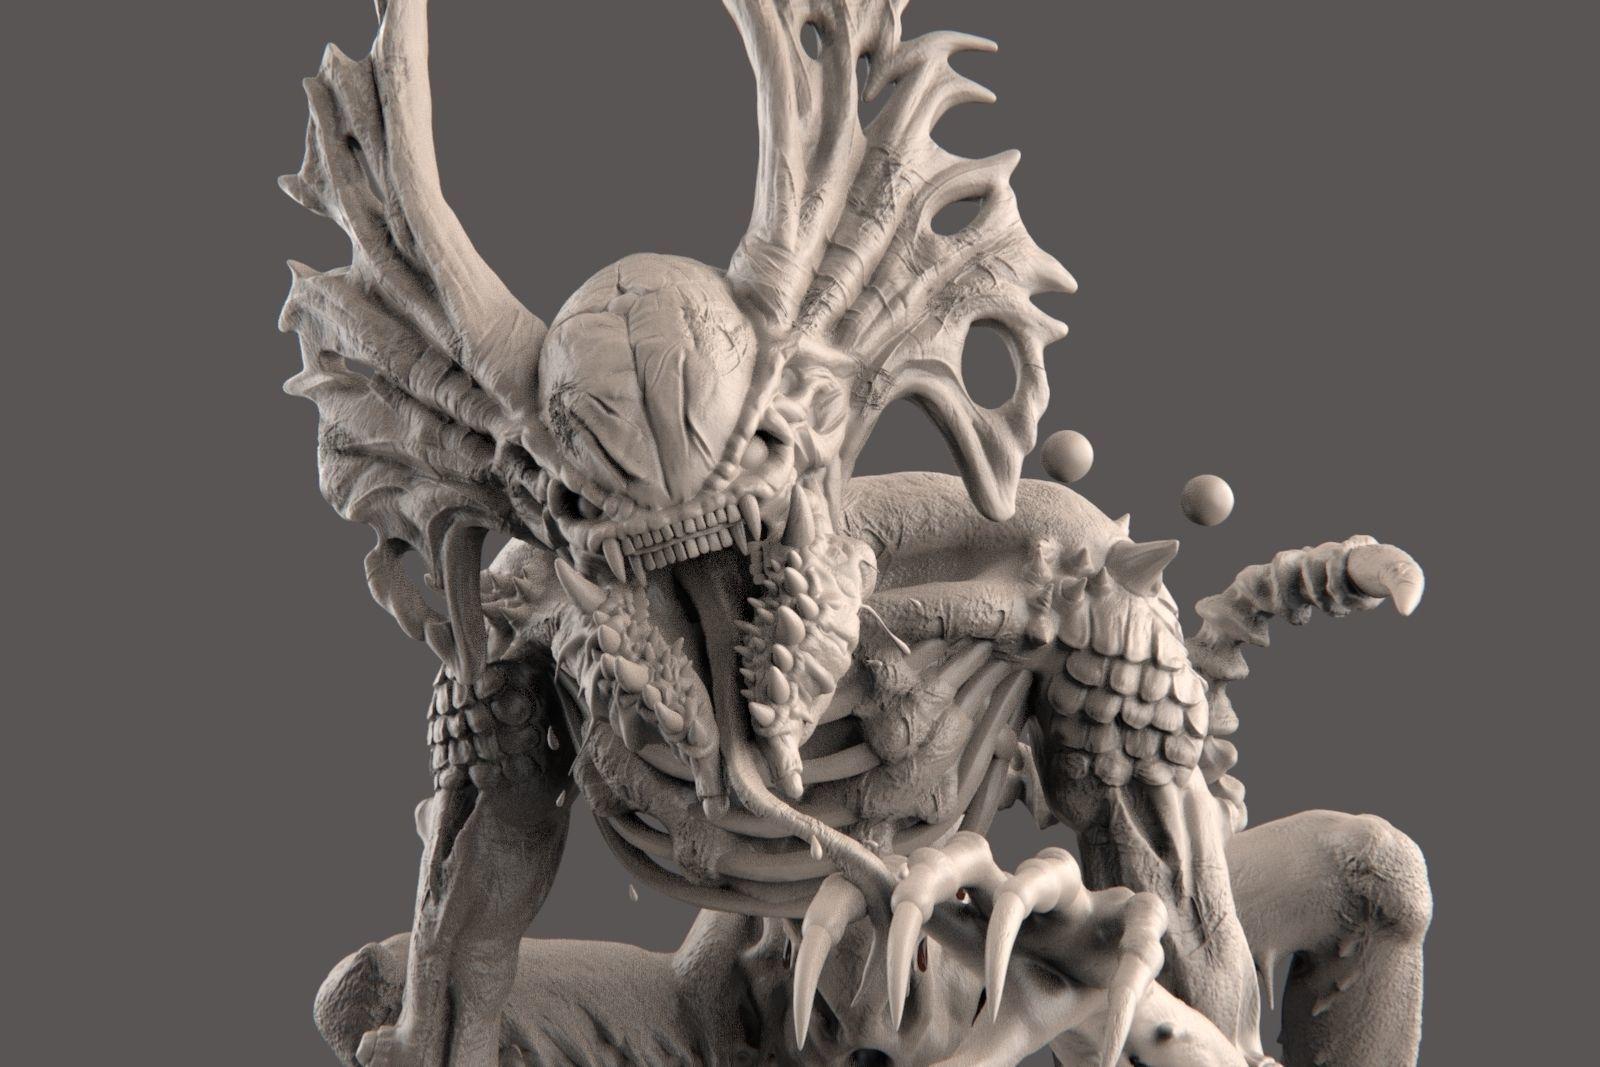 The Hunter - Alien Creature